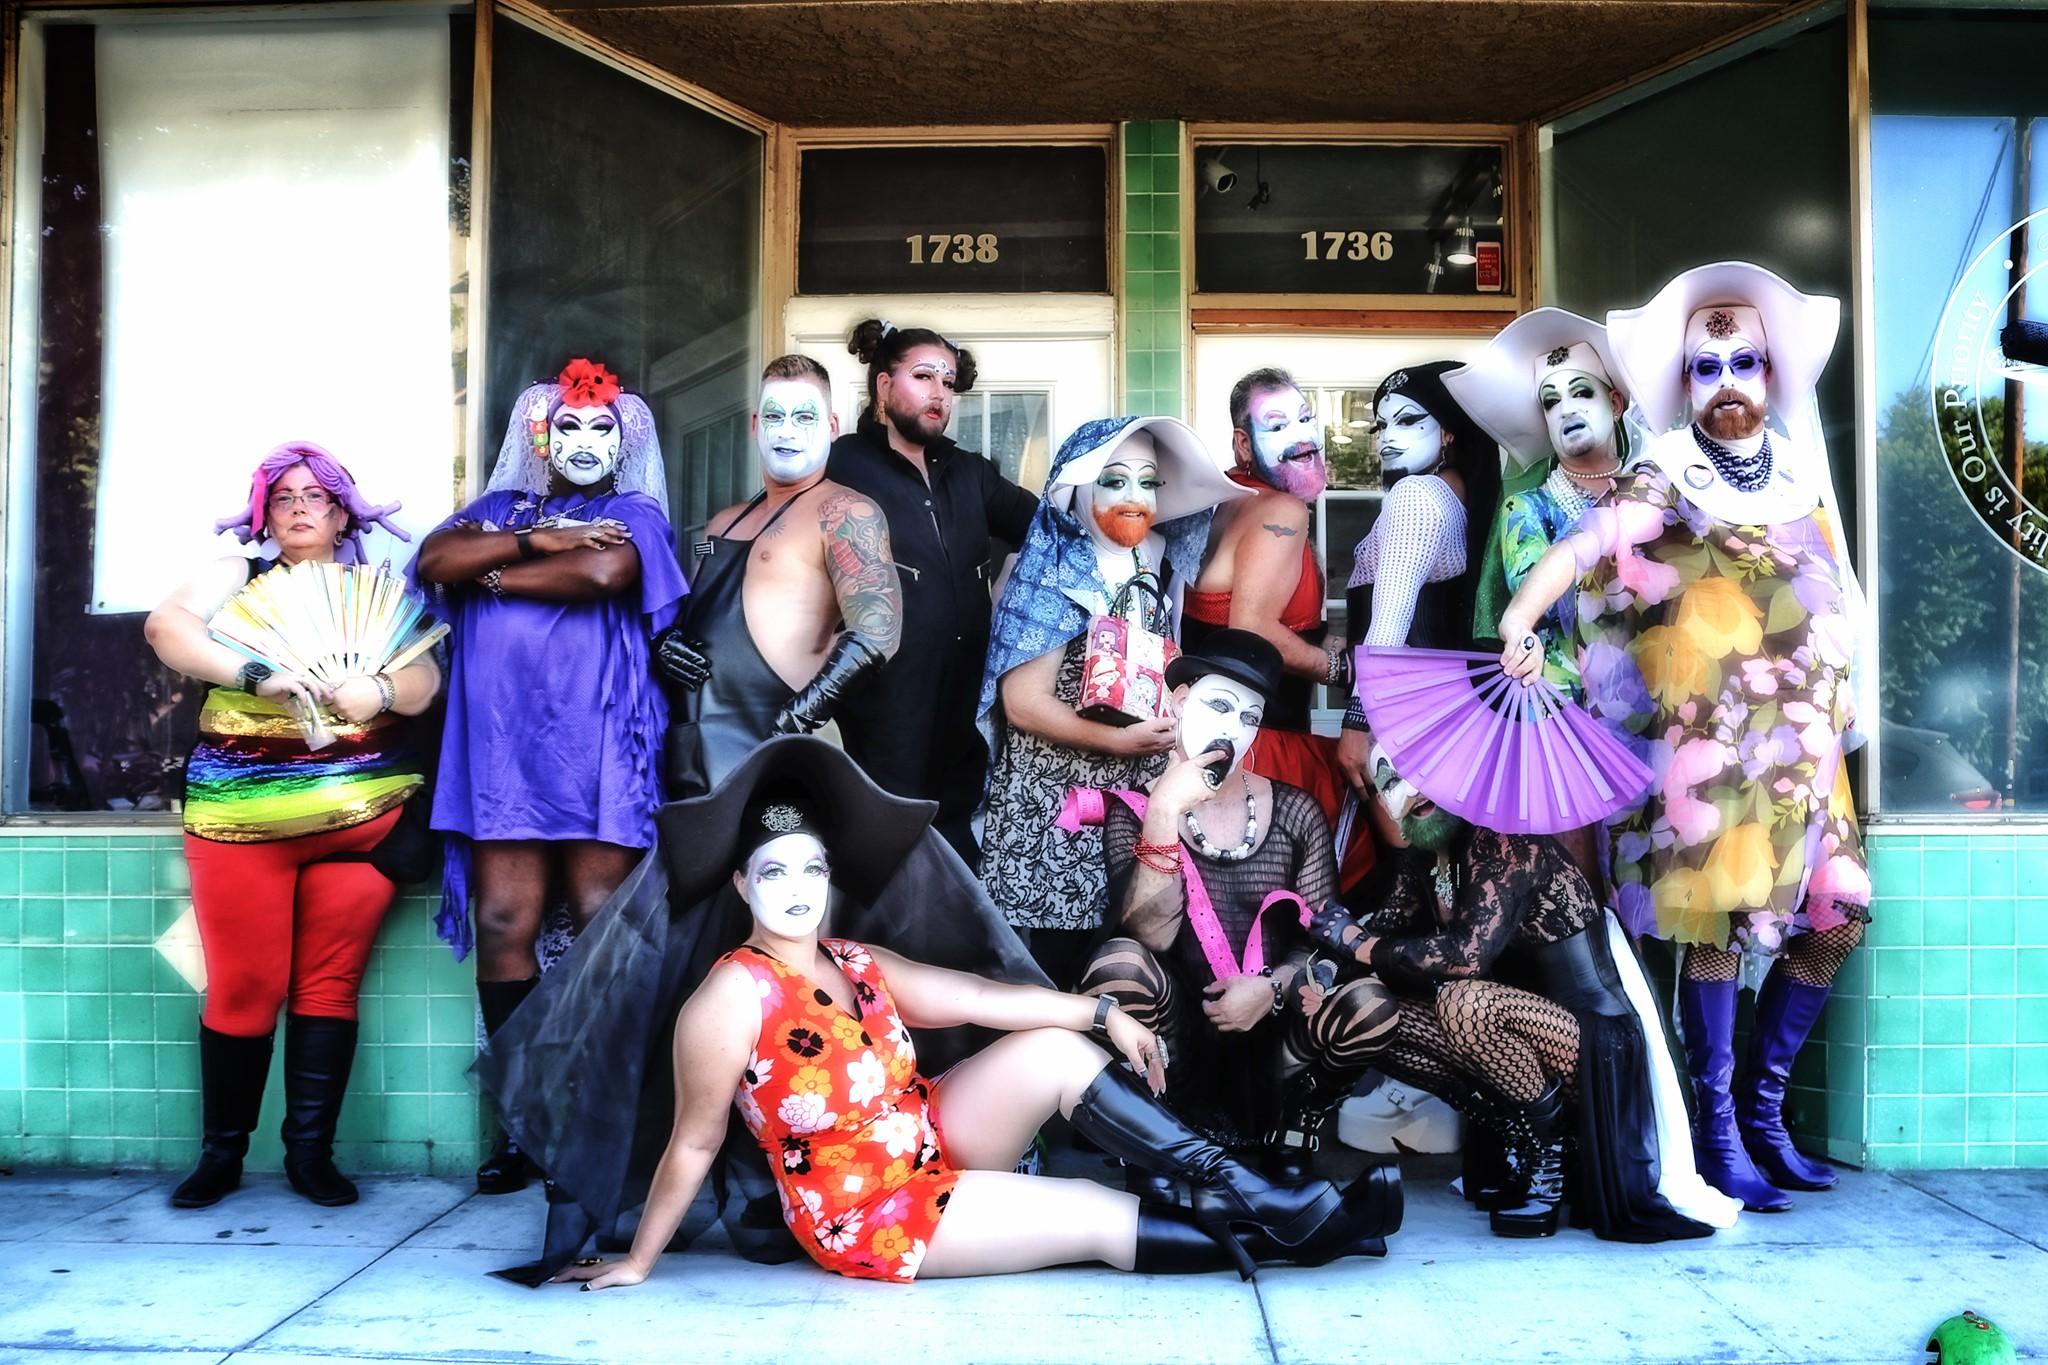 Photo Artist Jason Beamguard and his Models